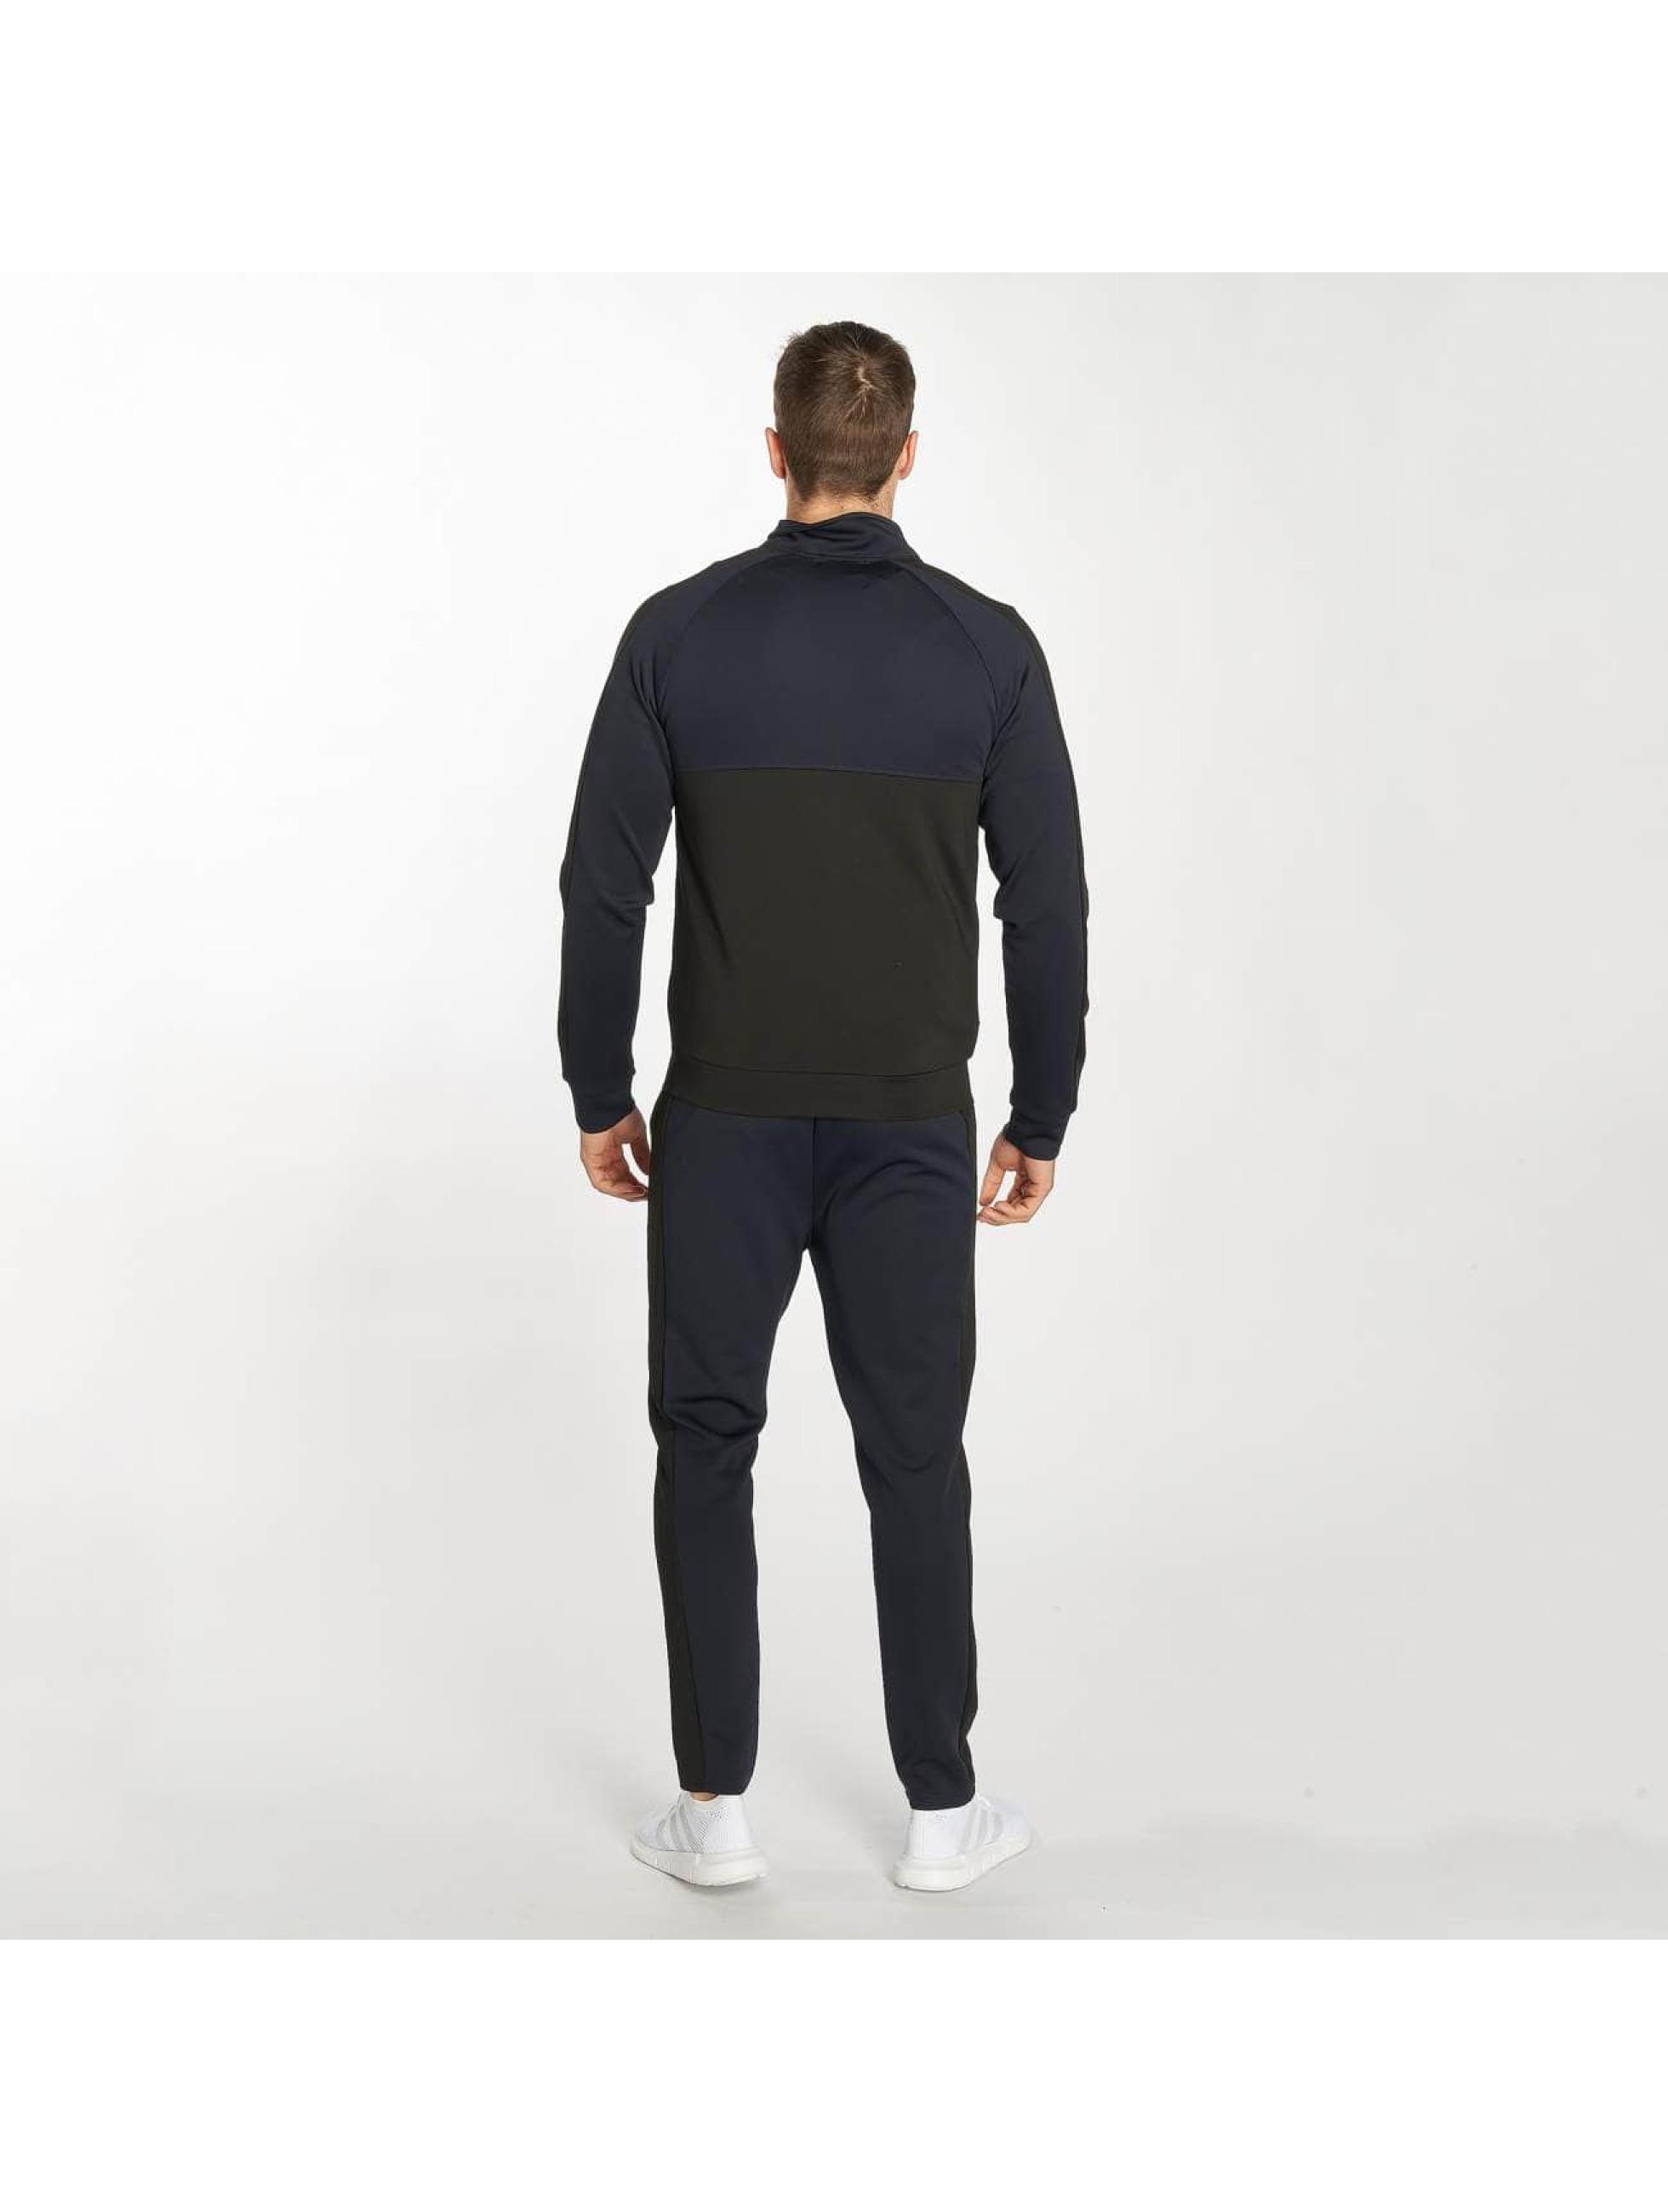 Zayne Paris Anzug Two-Tone blau